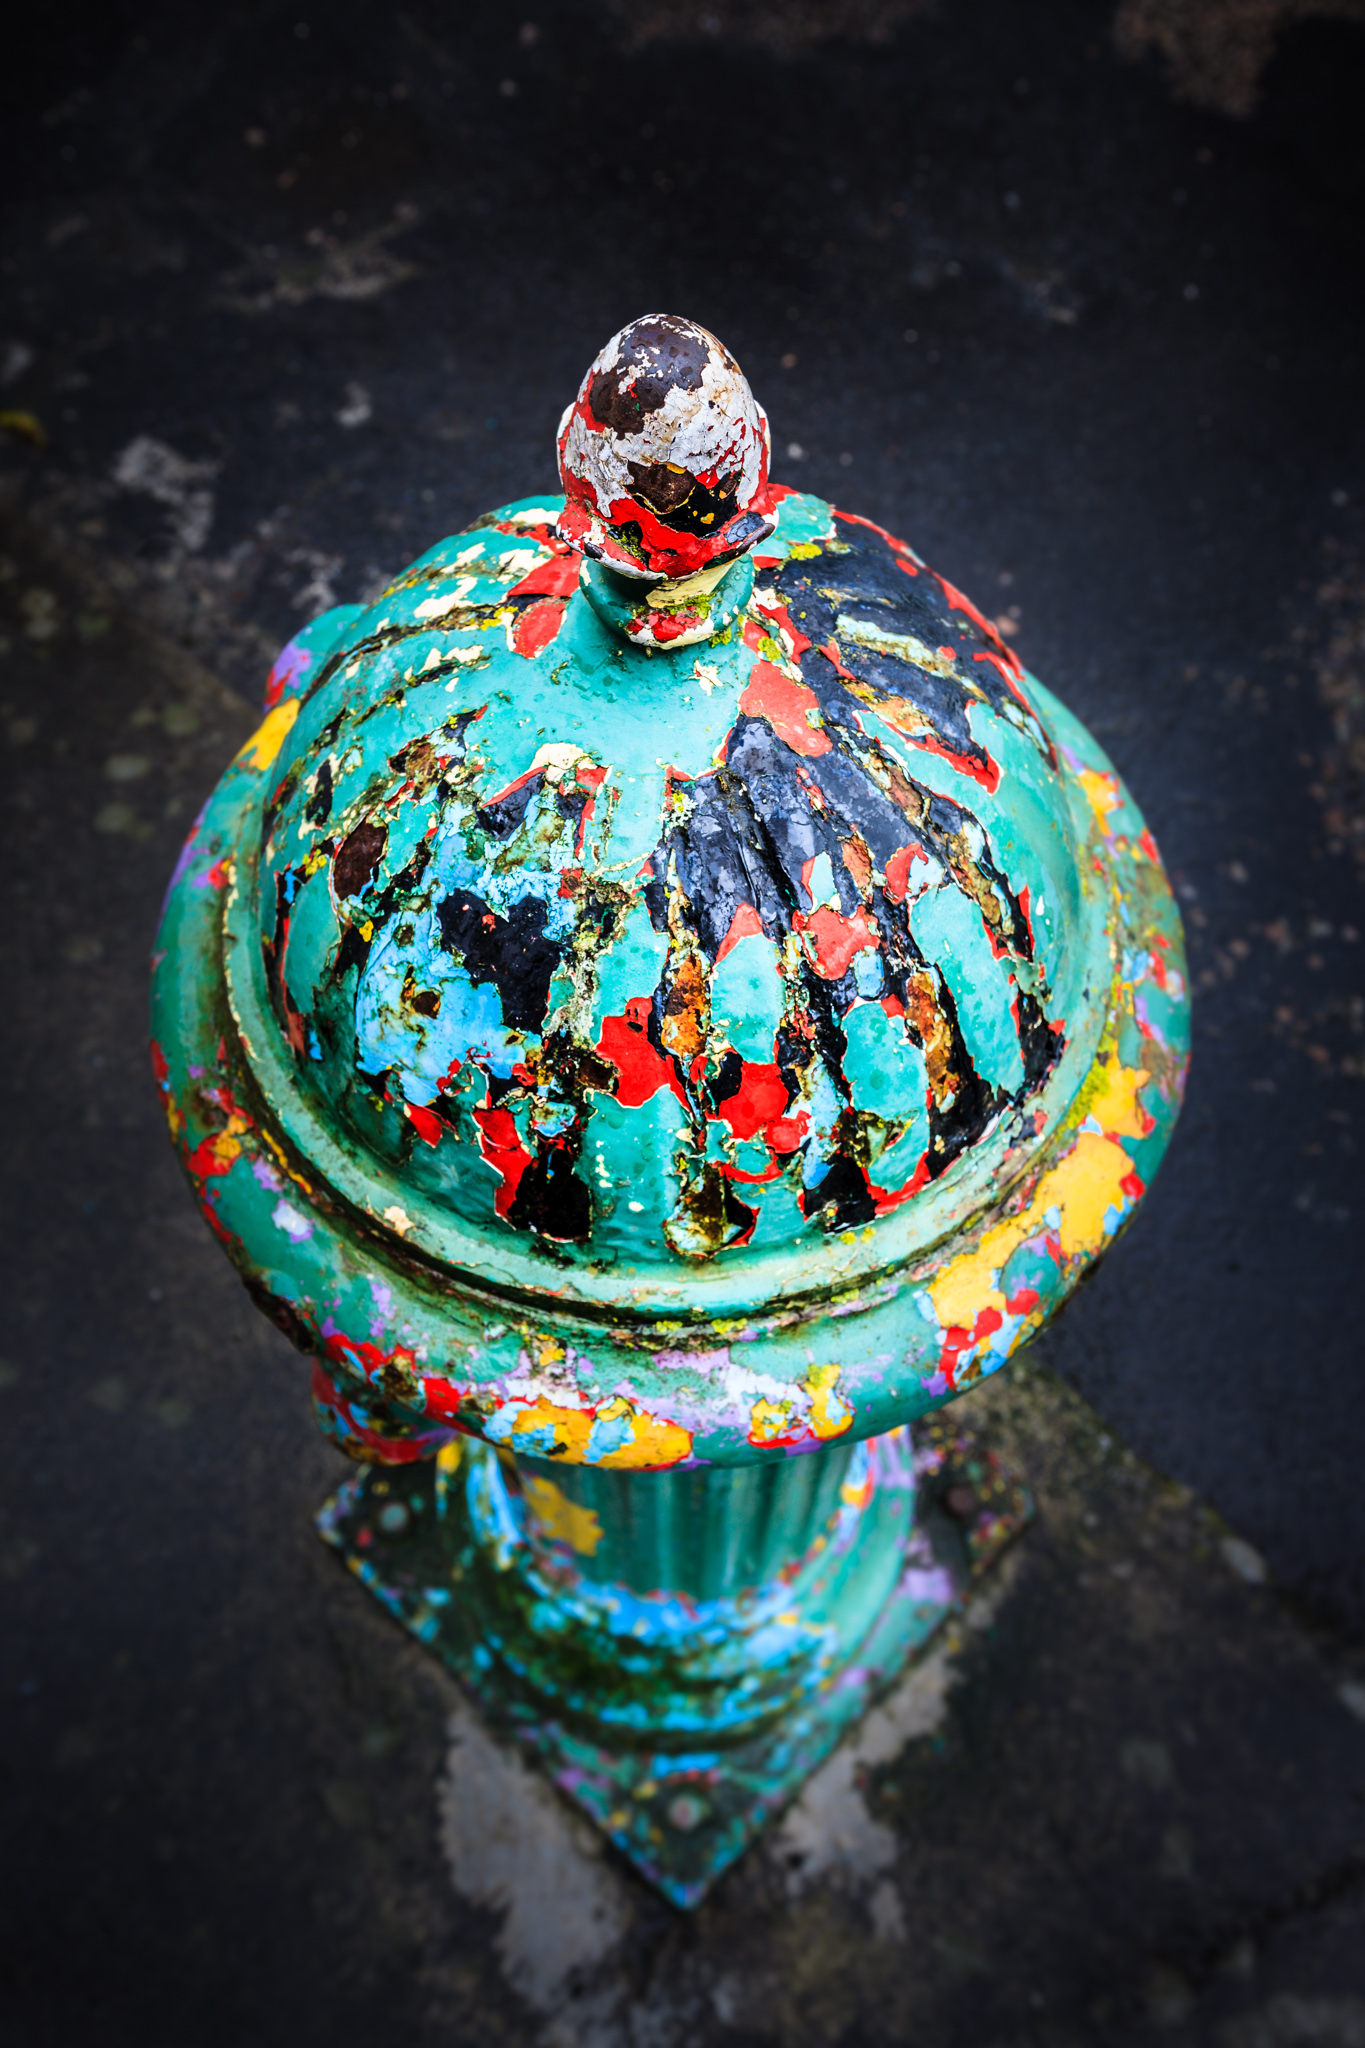 Irish Fire Hydrant